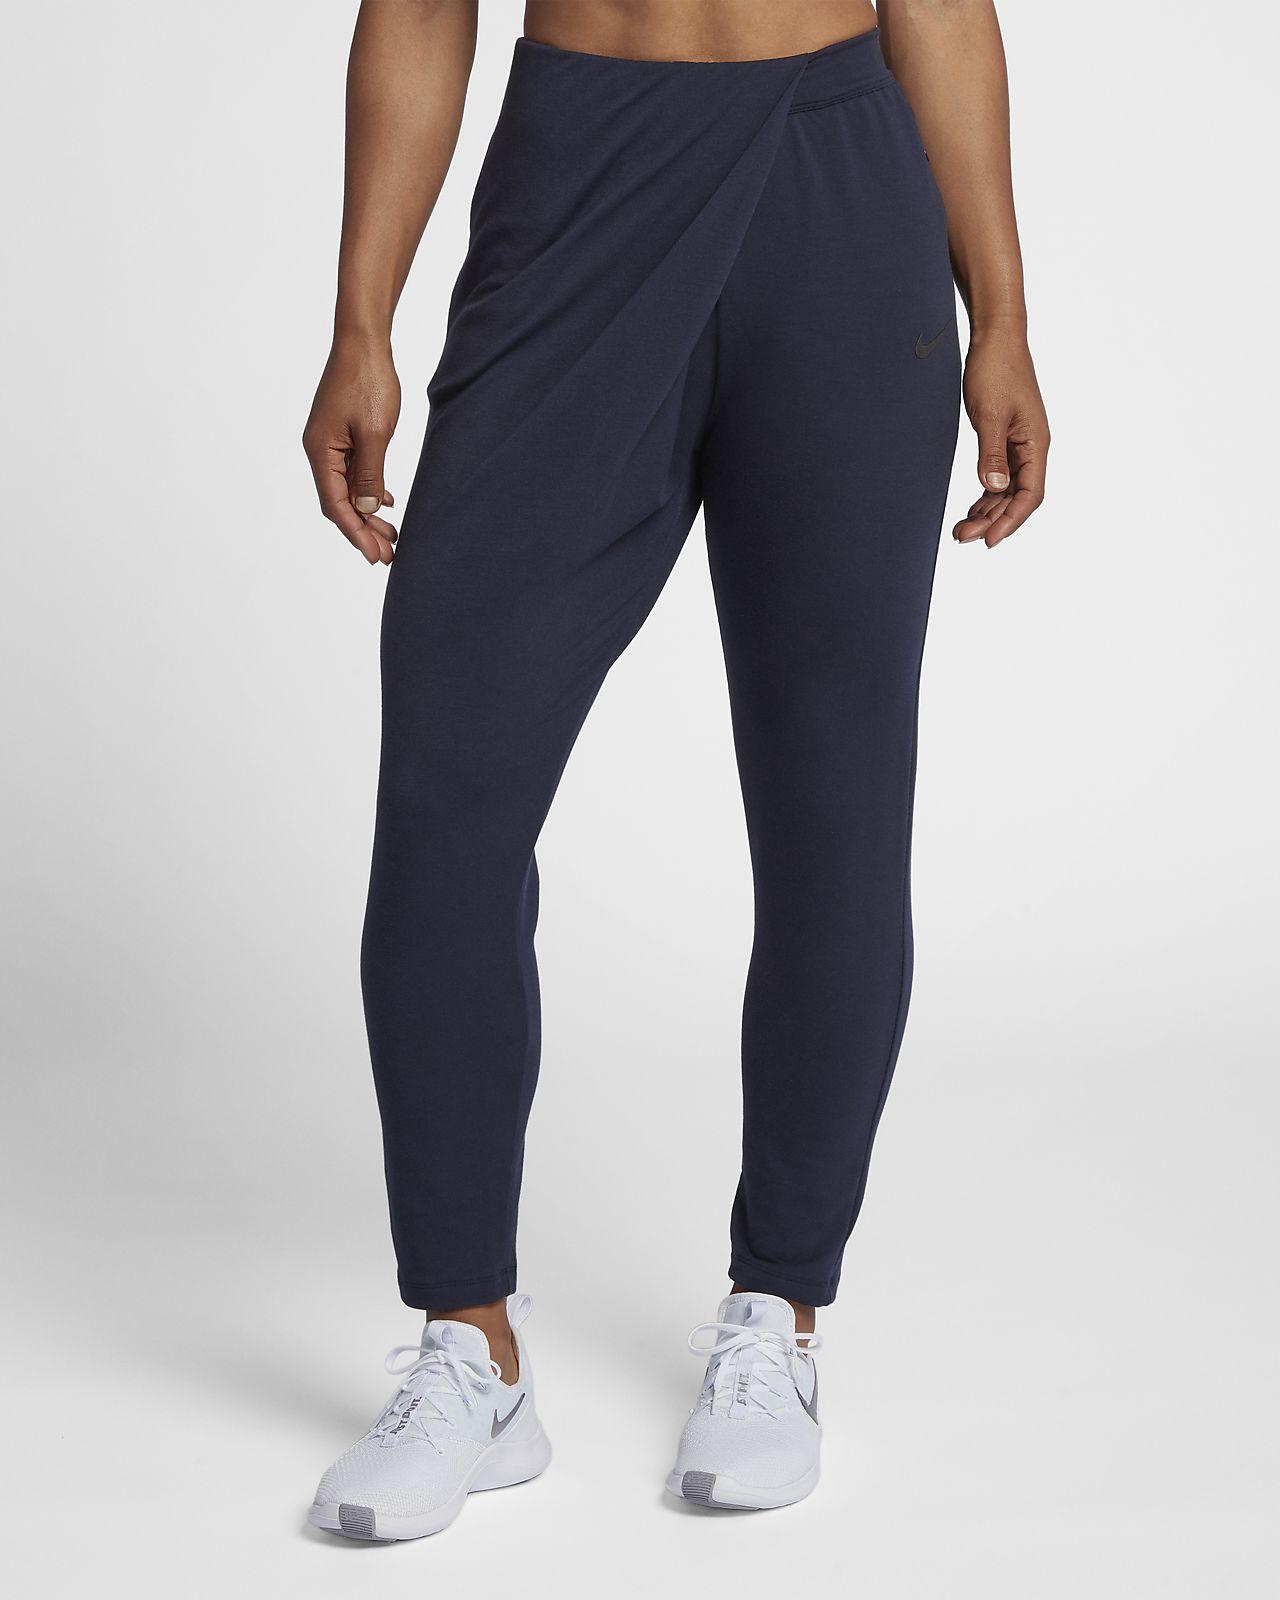 Mi Dri Fit Studio De Basse Pour Nike Training Taille Pantalon Femme qxAt1w6OY